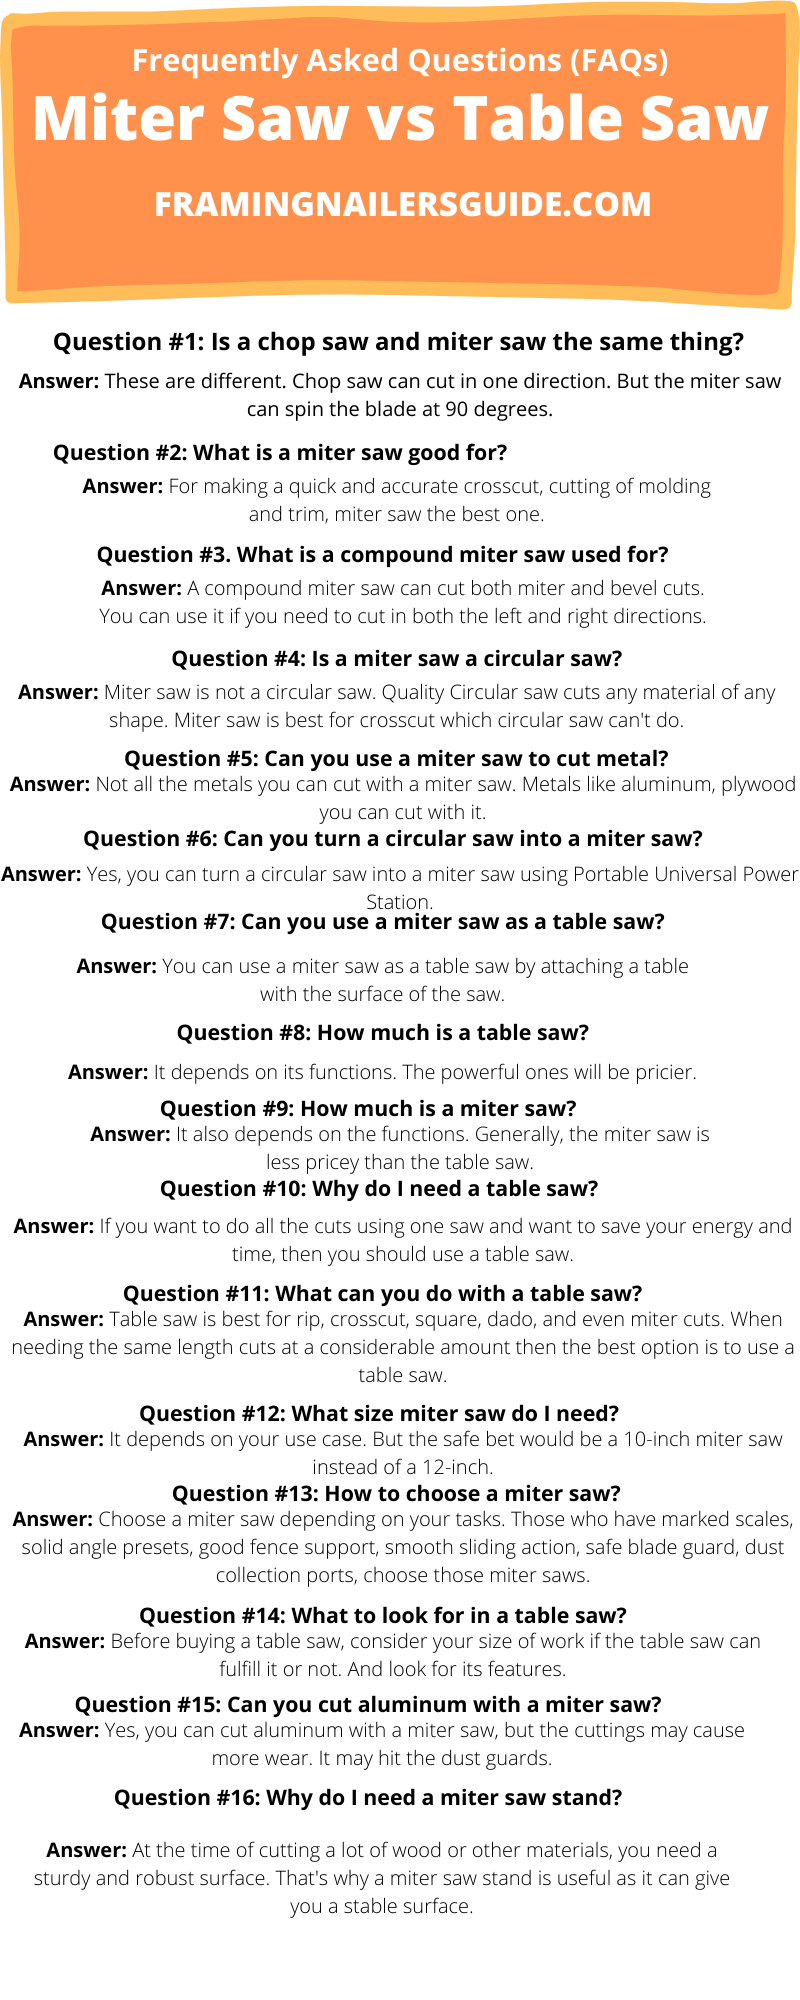 table saw vs miter saw FAQs